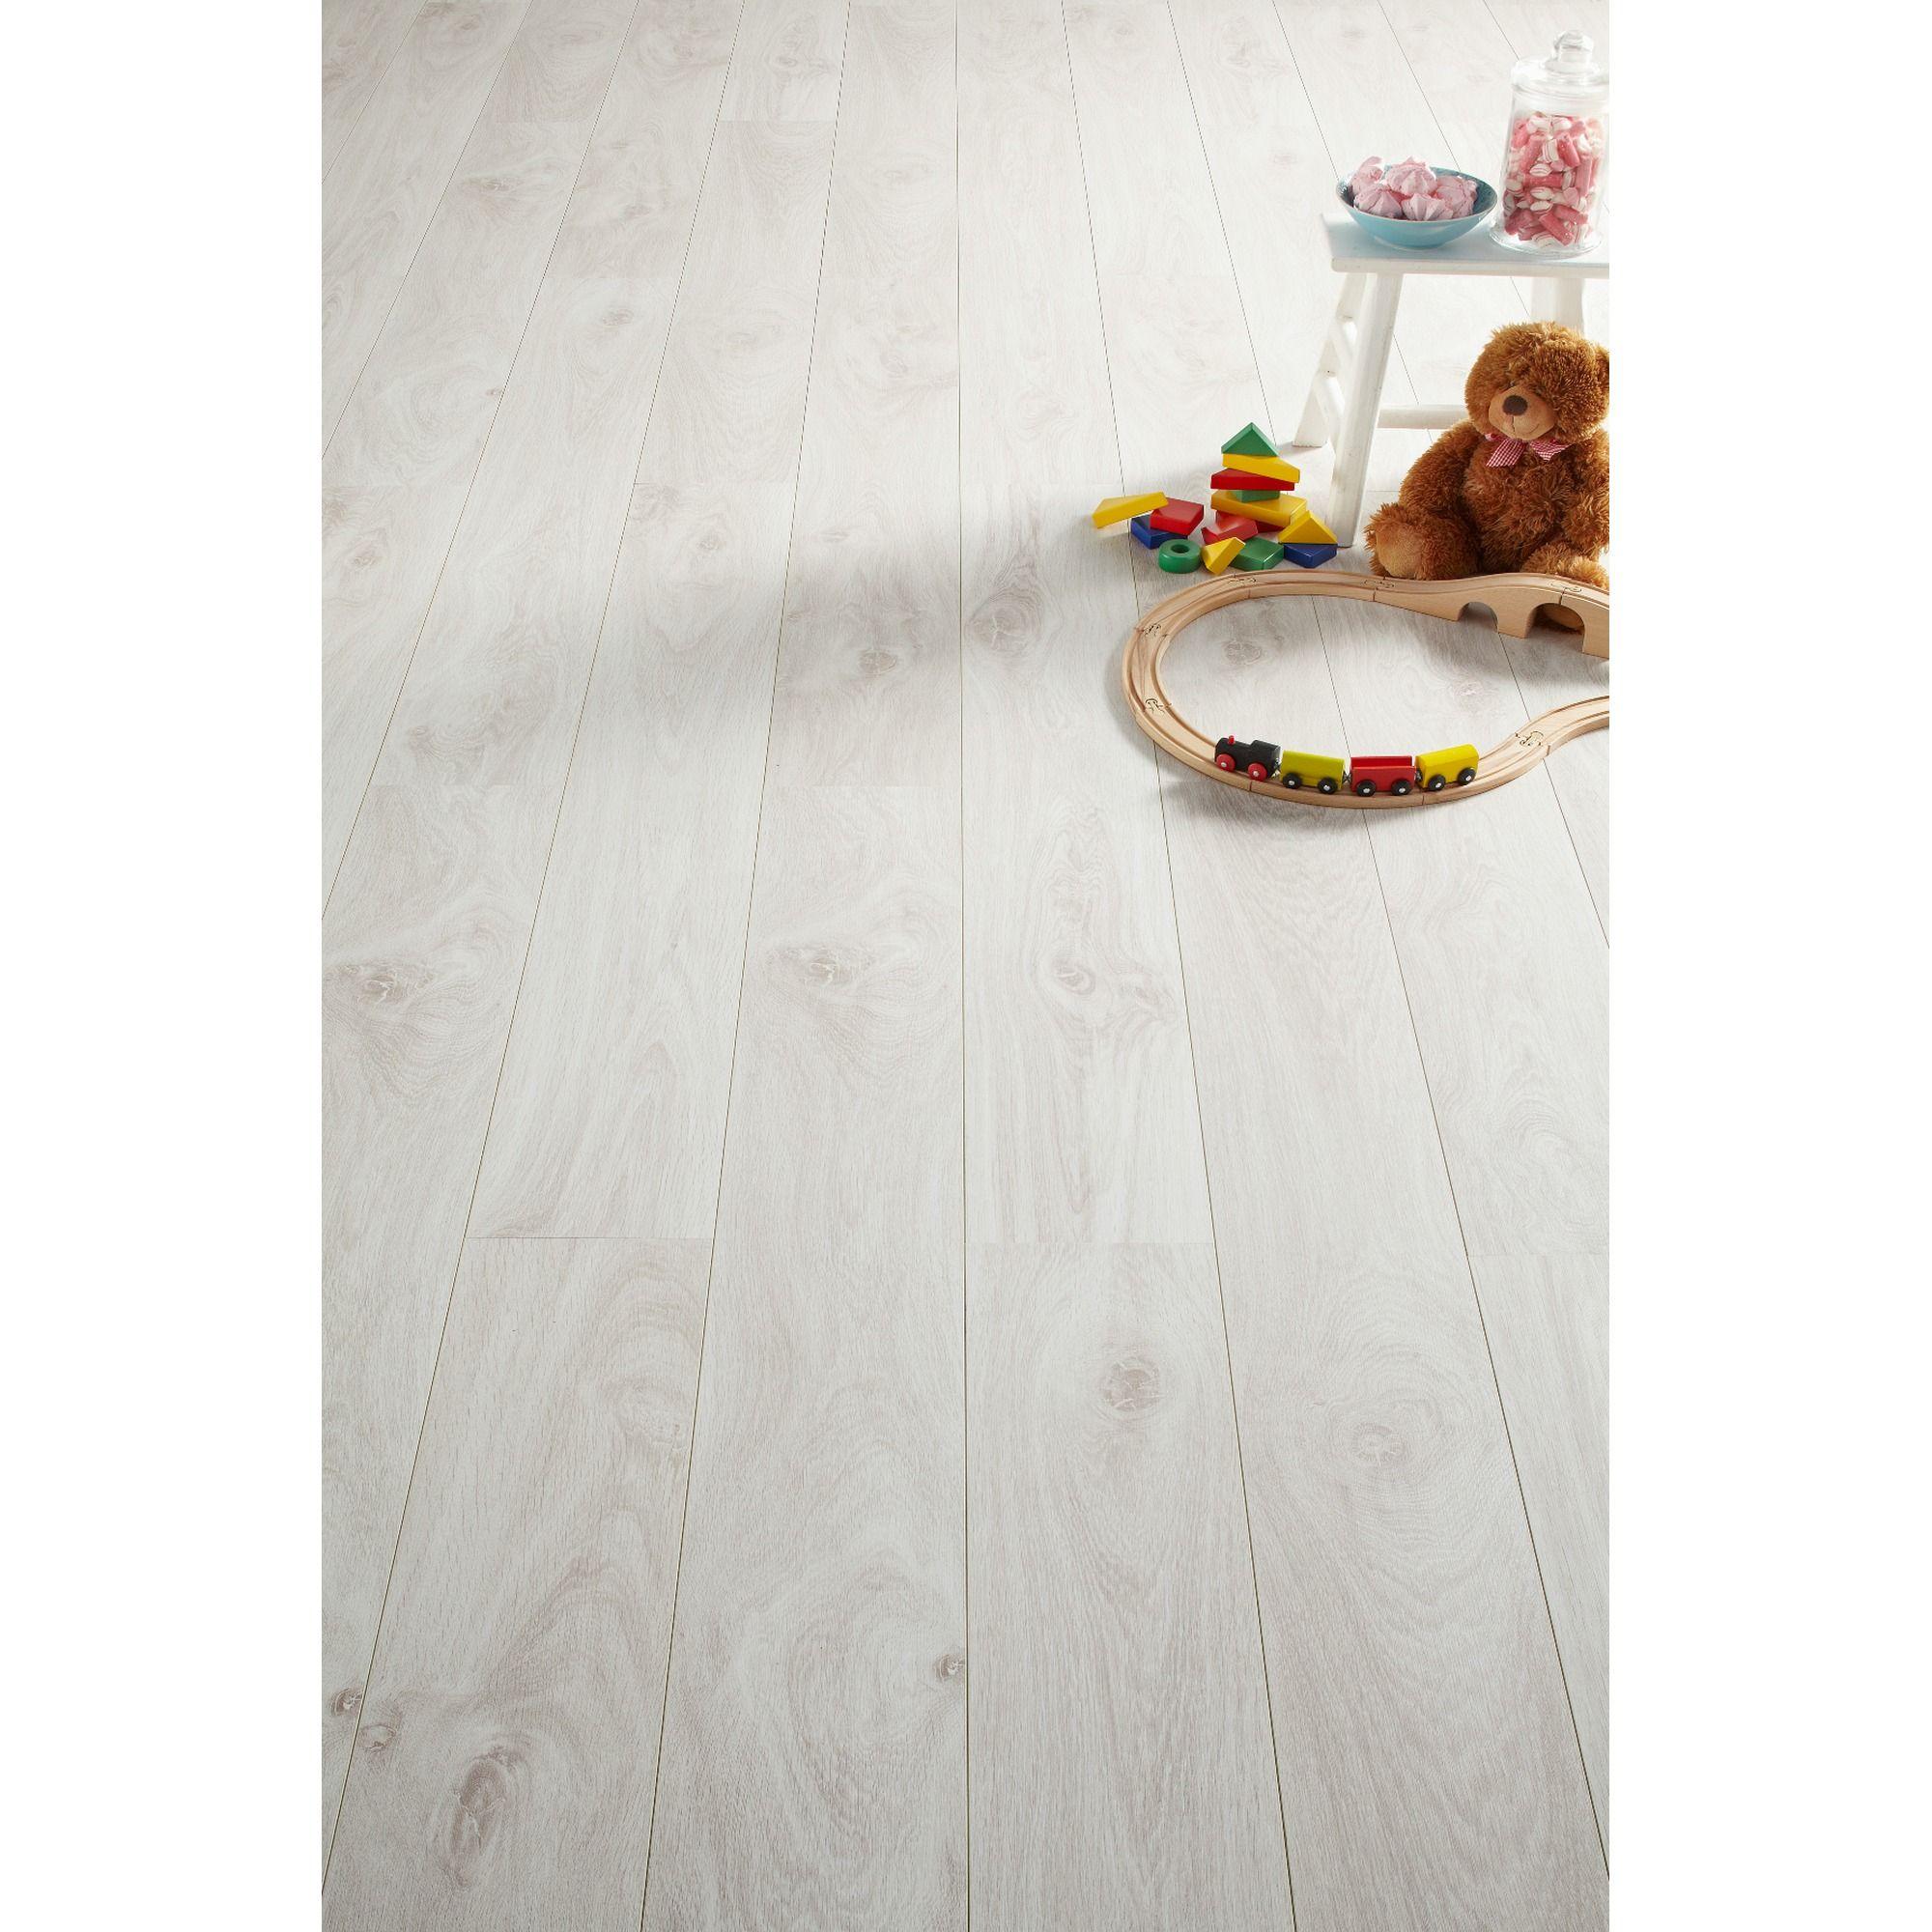 Gamma Witte Planken.Gamma Ambiance Laminaat Met V Groef Wit Eiken 2 25 M Huis Home